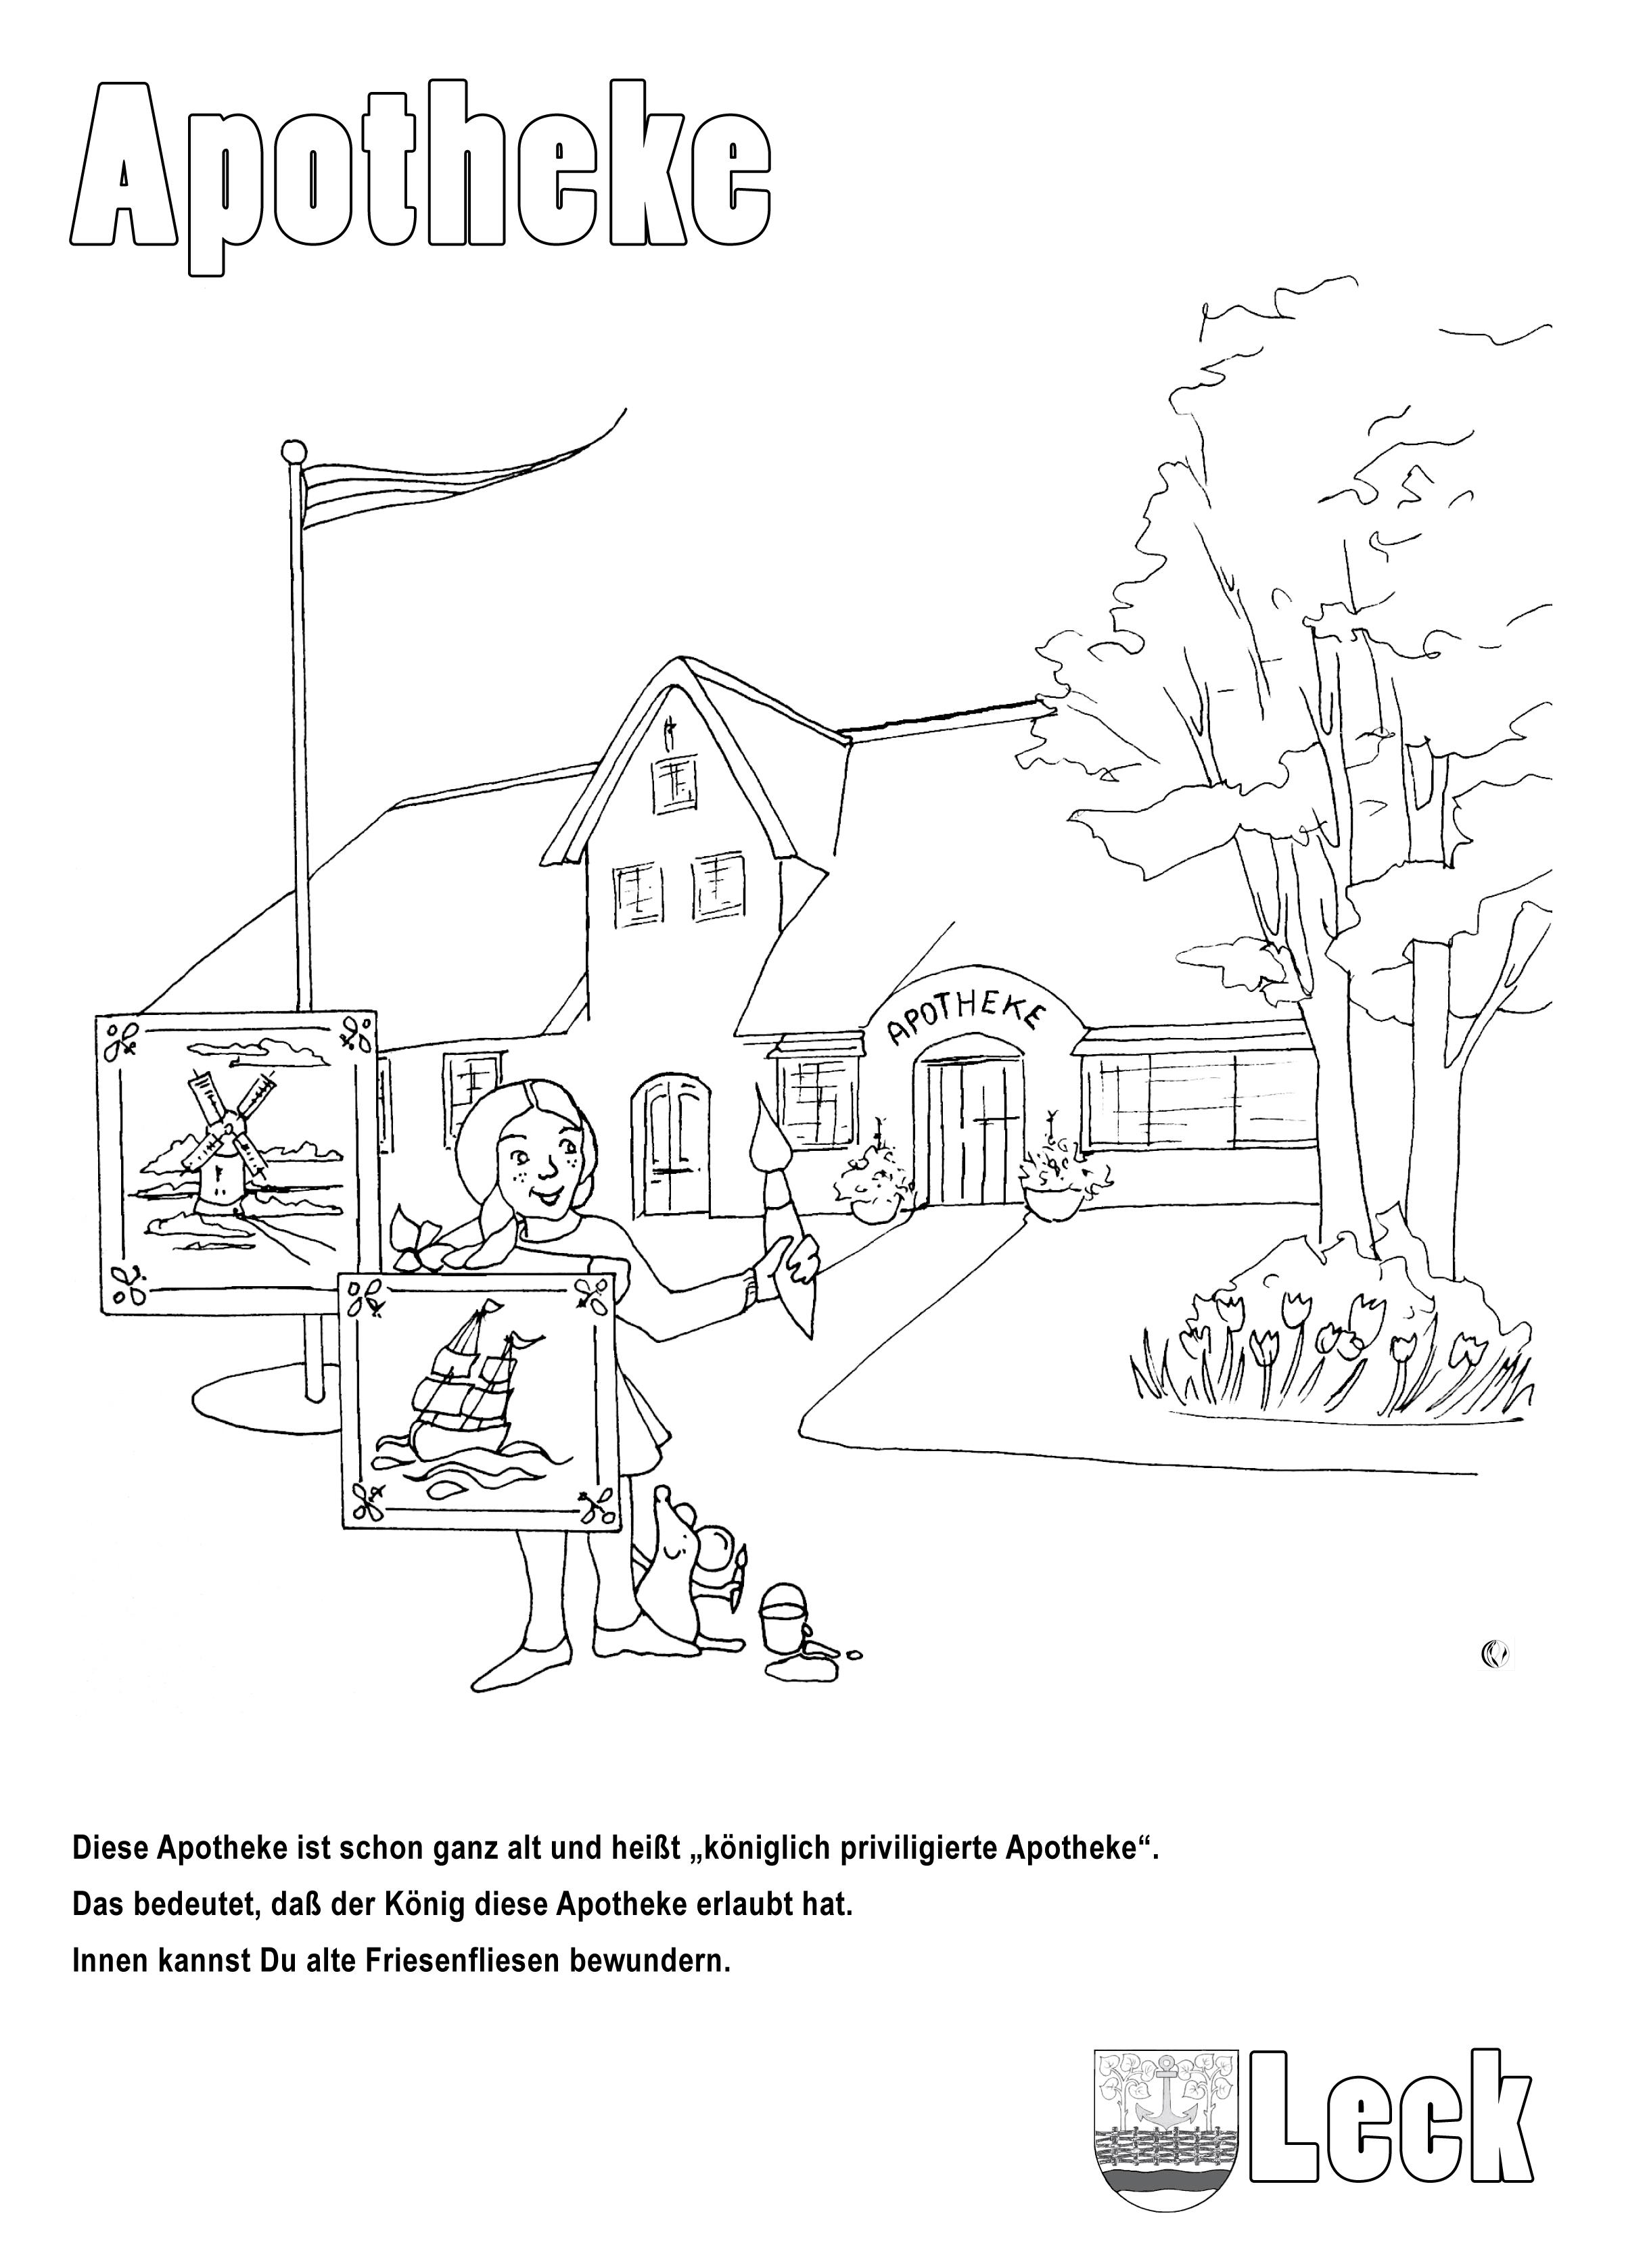 Charmant Ausmalbilder Apotheke Ideen - Framing Malvorlagen ...